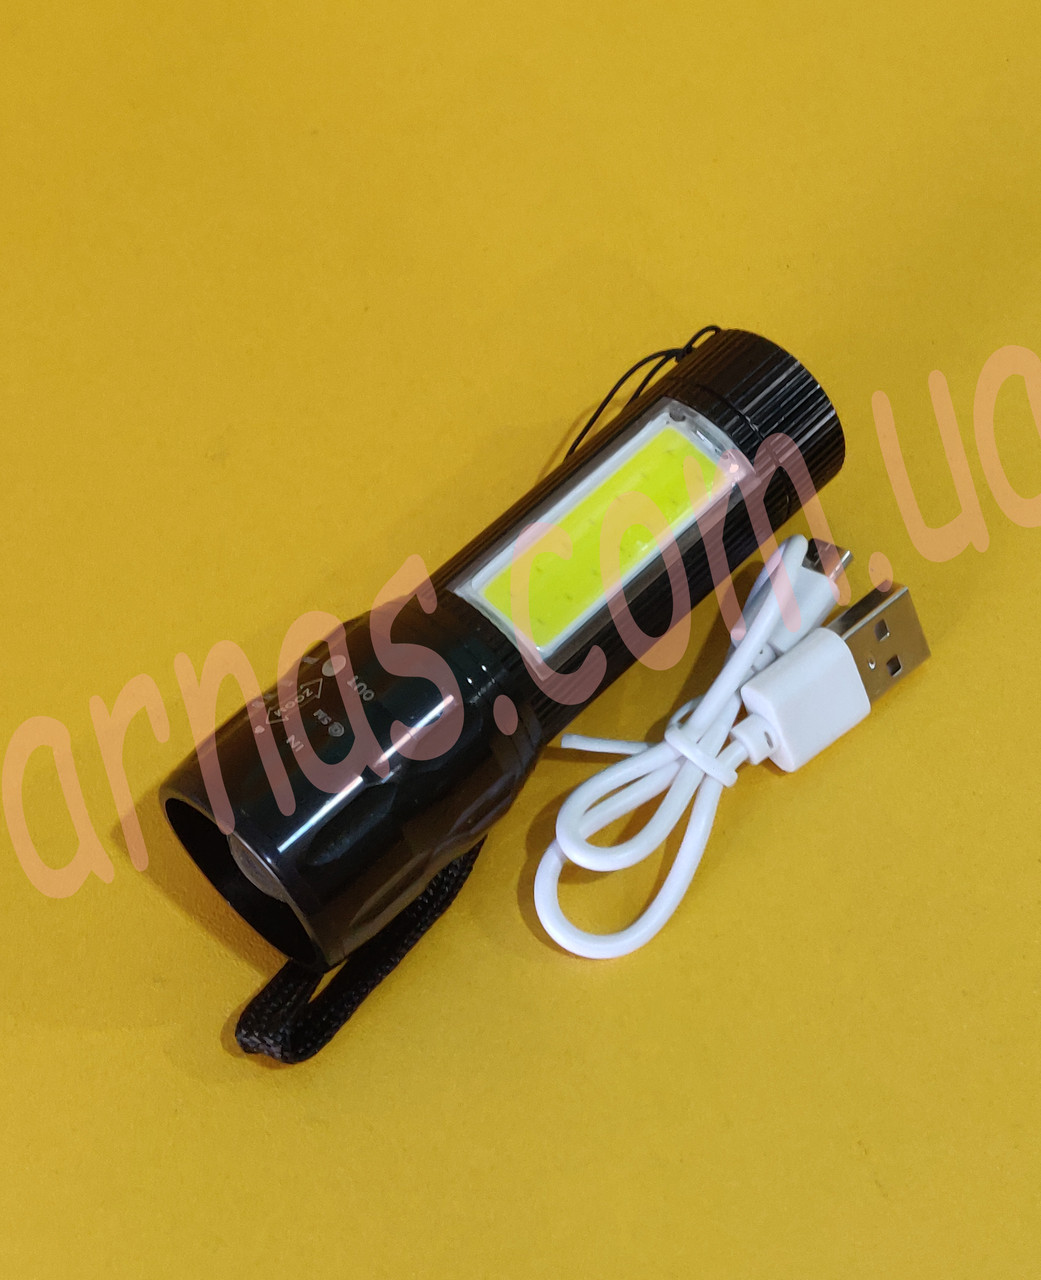 Аккумуляторный фонарь BL-U09-2